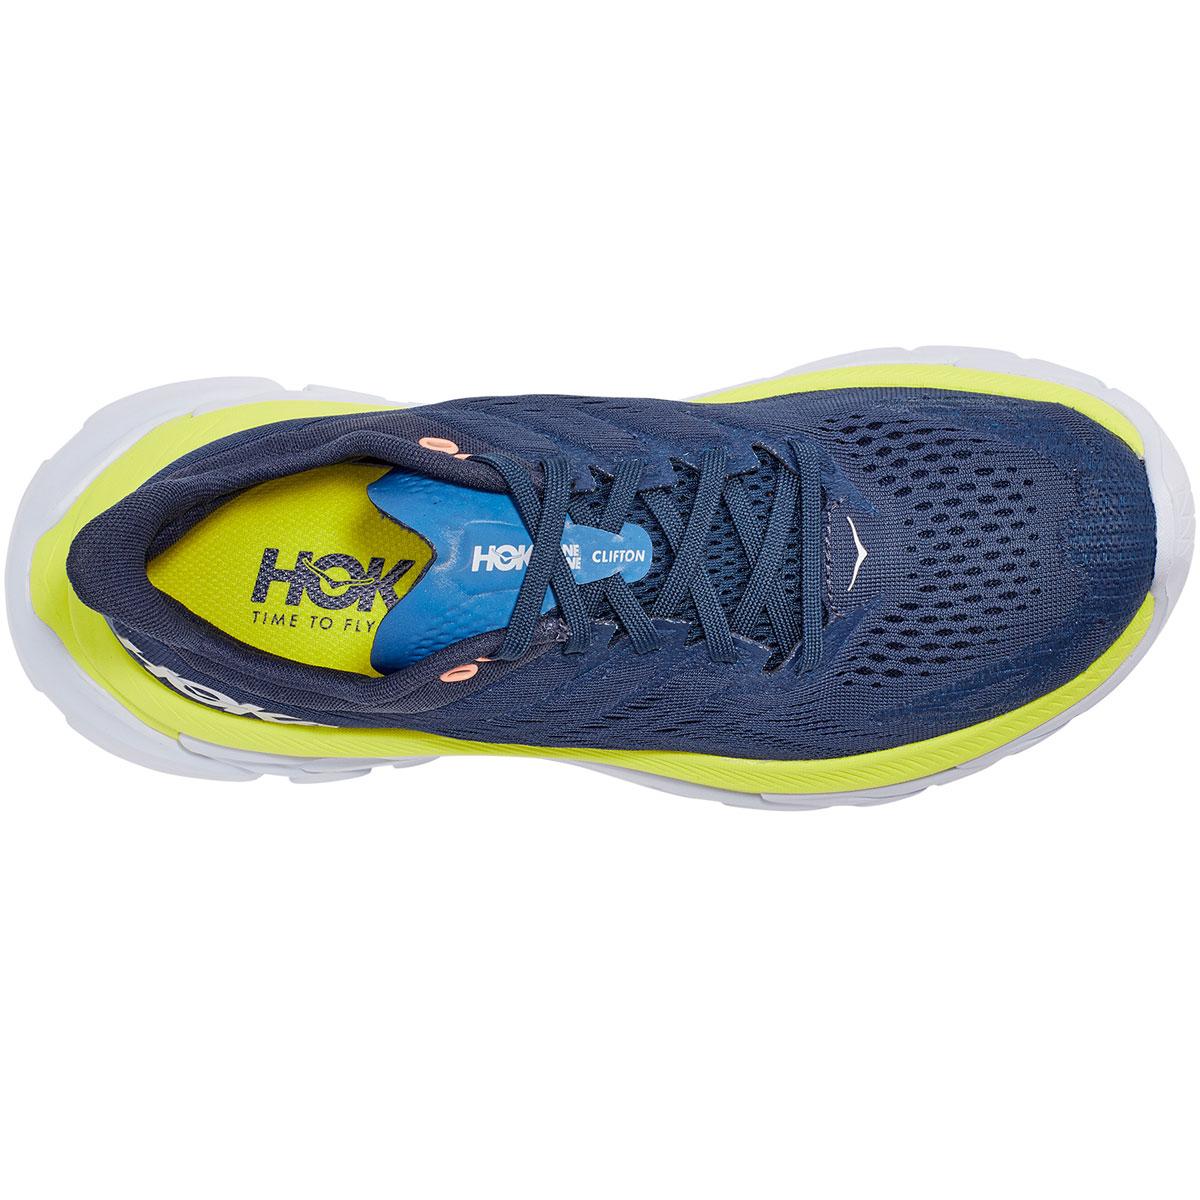 Women's Hoka One One Clifton Edge Running Shoe - Color: Moonlit Ocean/Evening Primrose - Size: 5 - Width: Regular, Moonlit Ocean/Evening Primrose, large, image 2